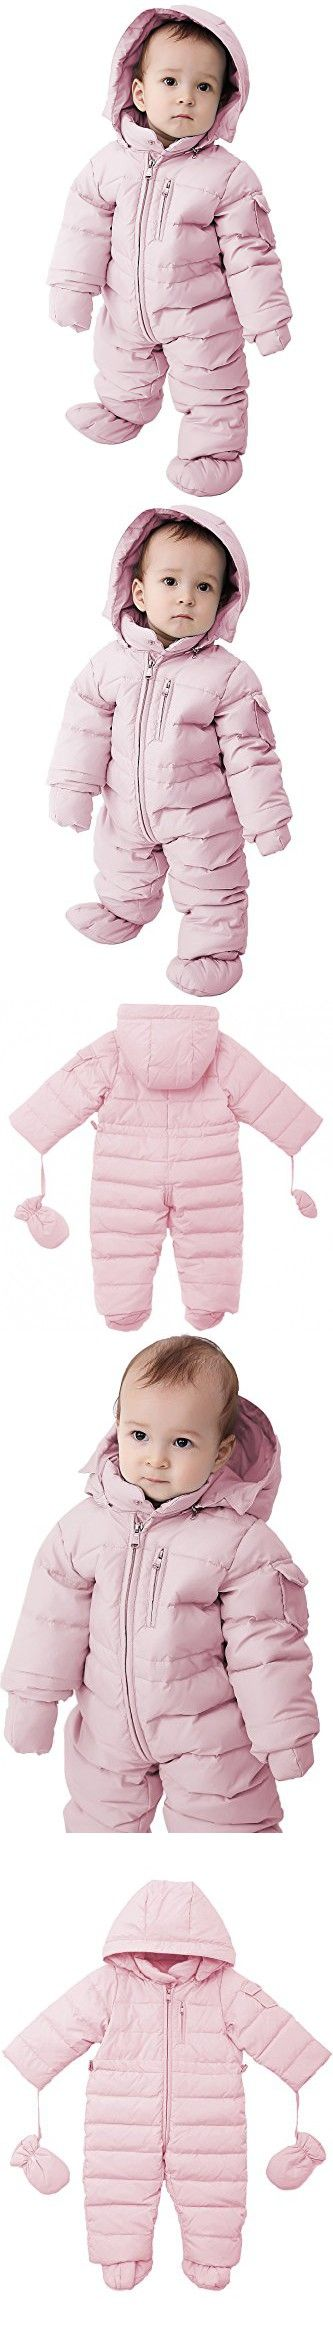 Oceankids Baby Boys Girls Pink Pram One-Piece Snowsuit Attached Hood 12M 9-12 Months